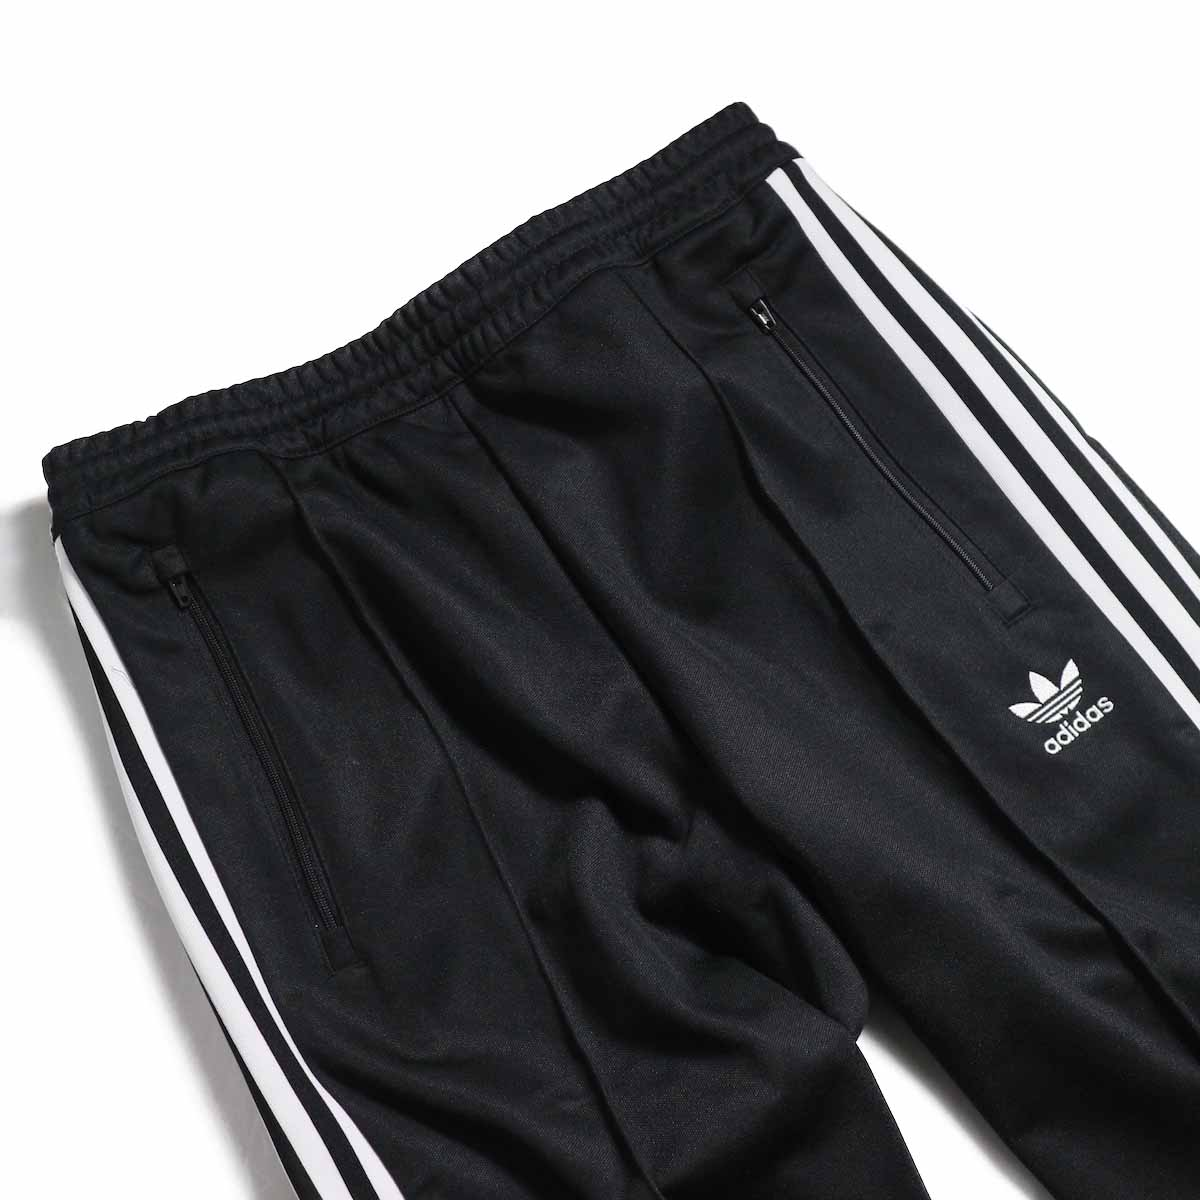 adidas originals / Beckenbauer Track Pants -Black ウエスト